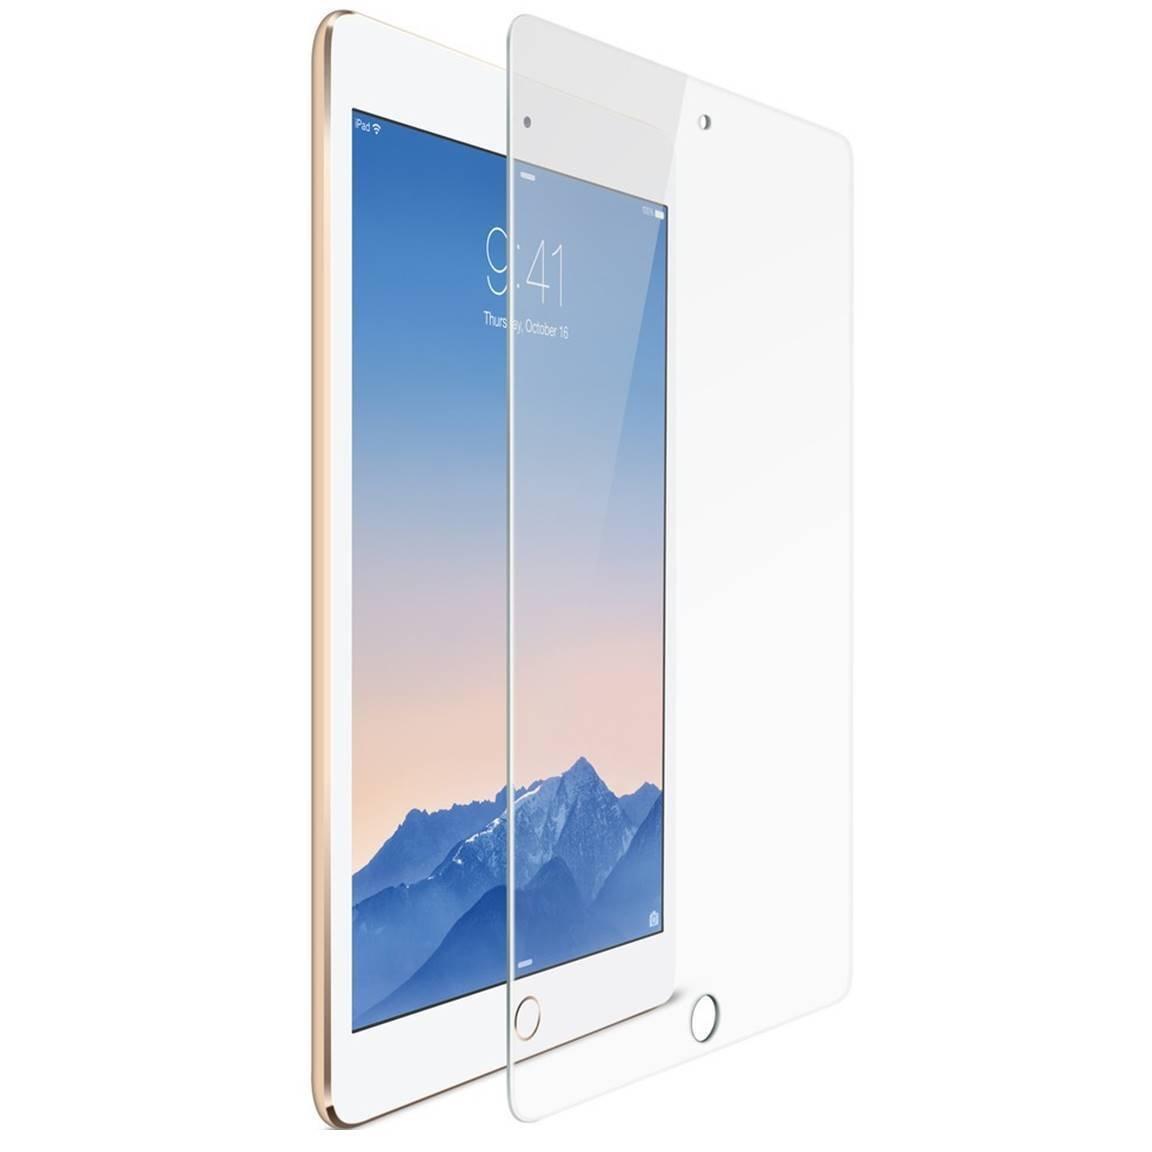 [2-PACK] iPad 9.7 (2018 & 2017) / iPad Pro 9.7 / iPad Air 2 / Air 1 Screen Protector, INKUZE Tempered Glass Screen Protector